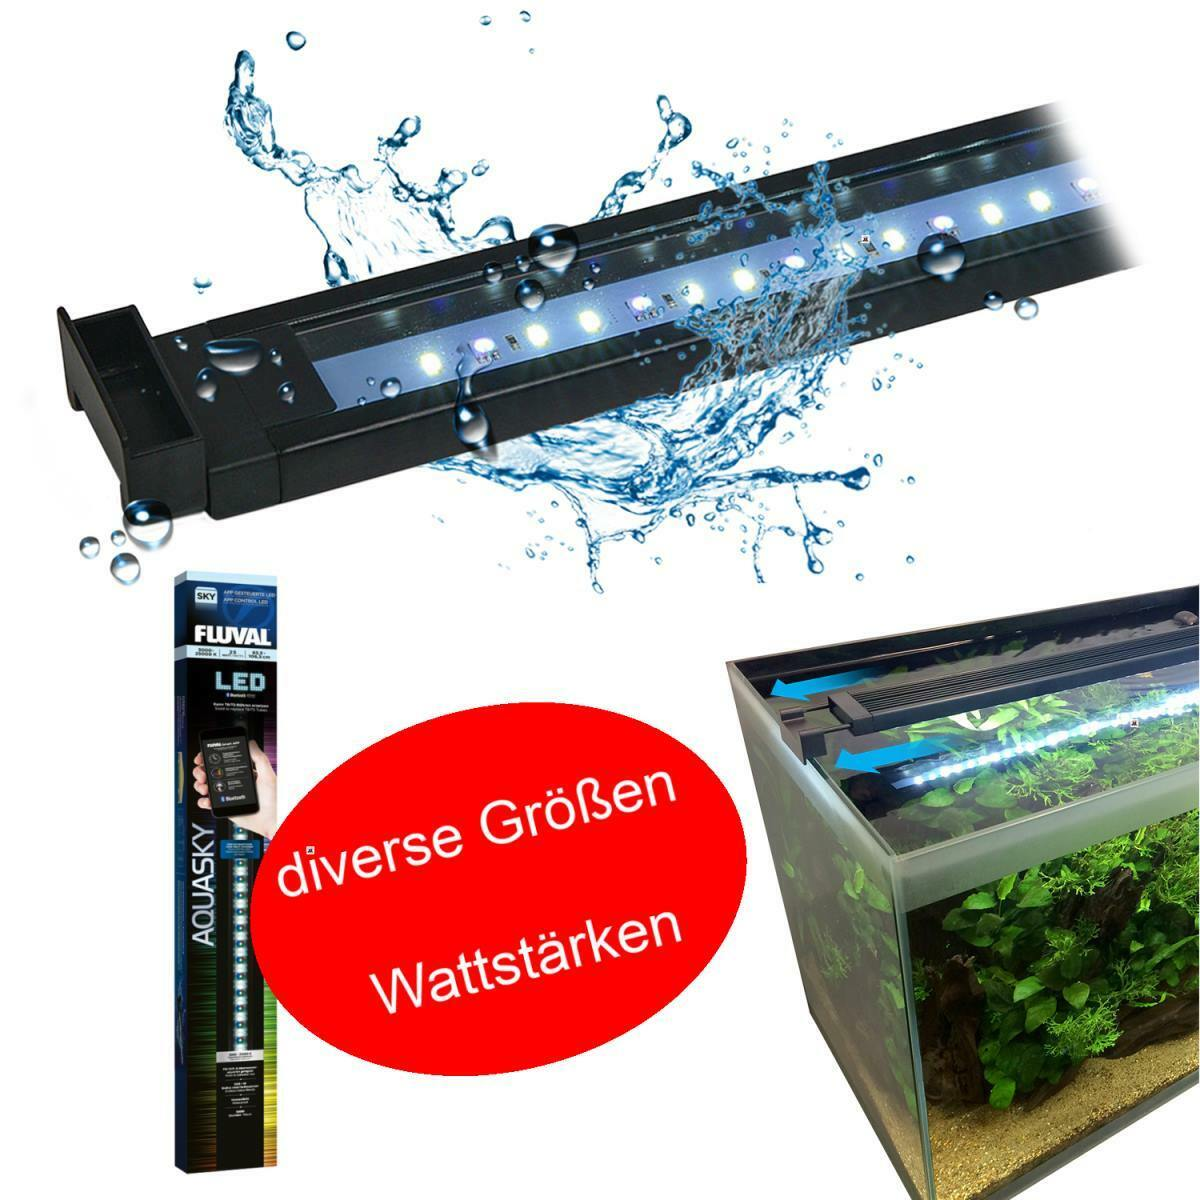 Fluval AquaSky LED Aquariumbeleuchtung FluvalSmart App Technologie in 7 Größen